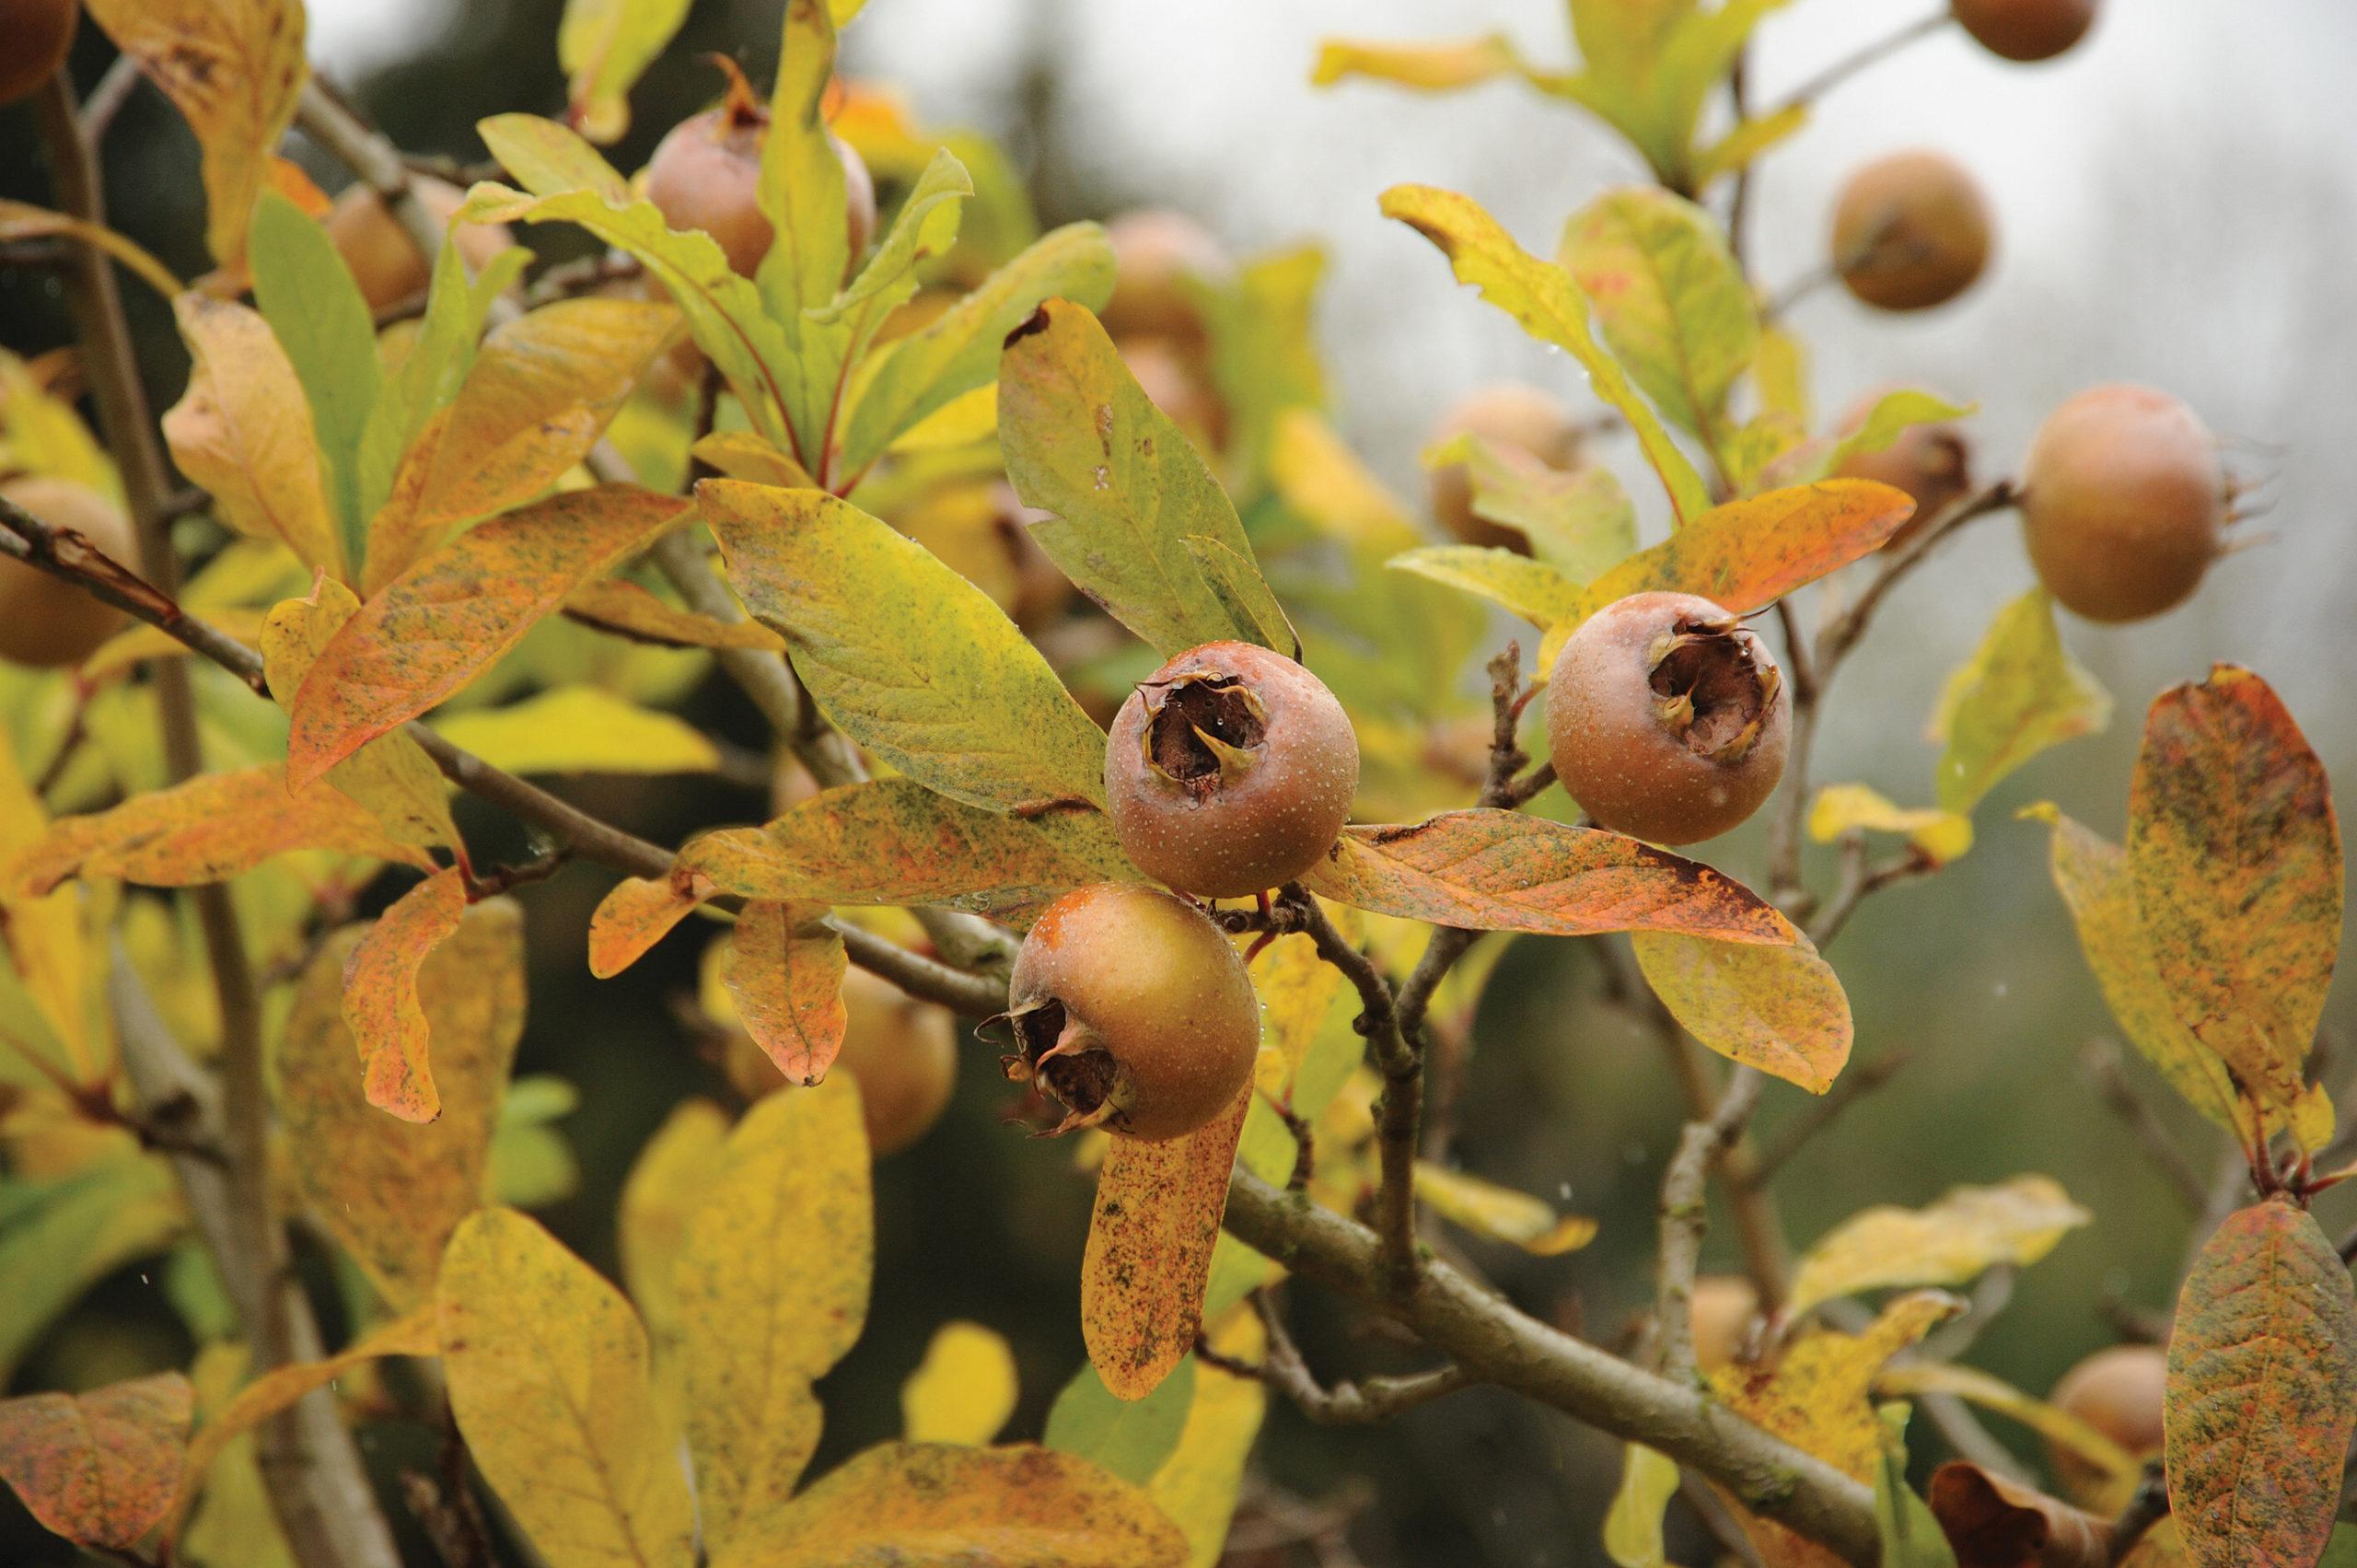 Ripe medlar fruit on branch in autumn